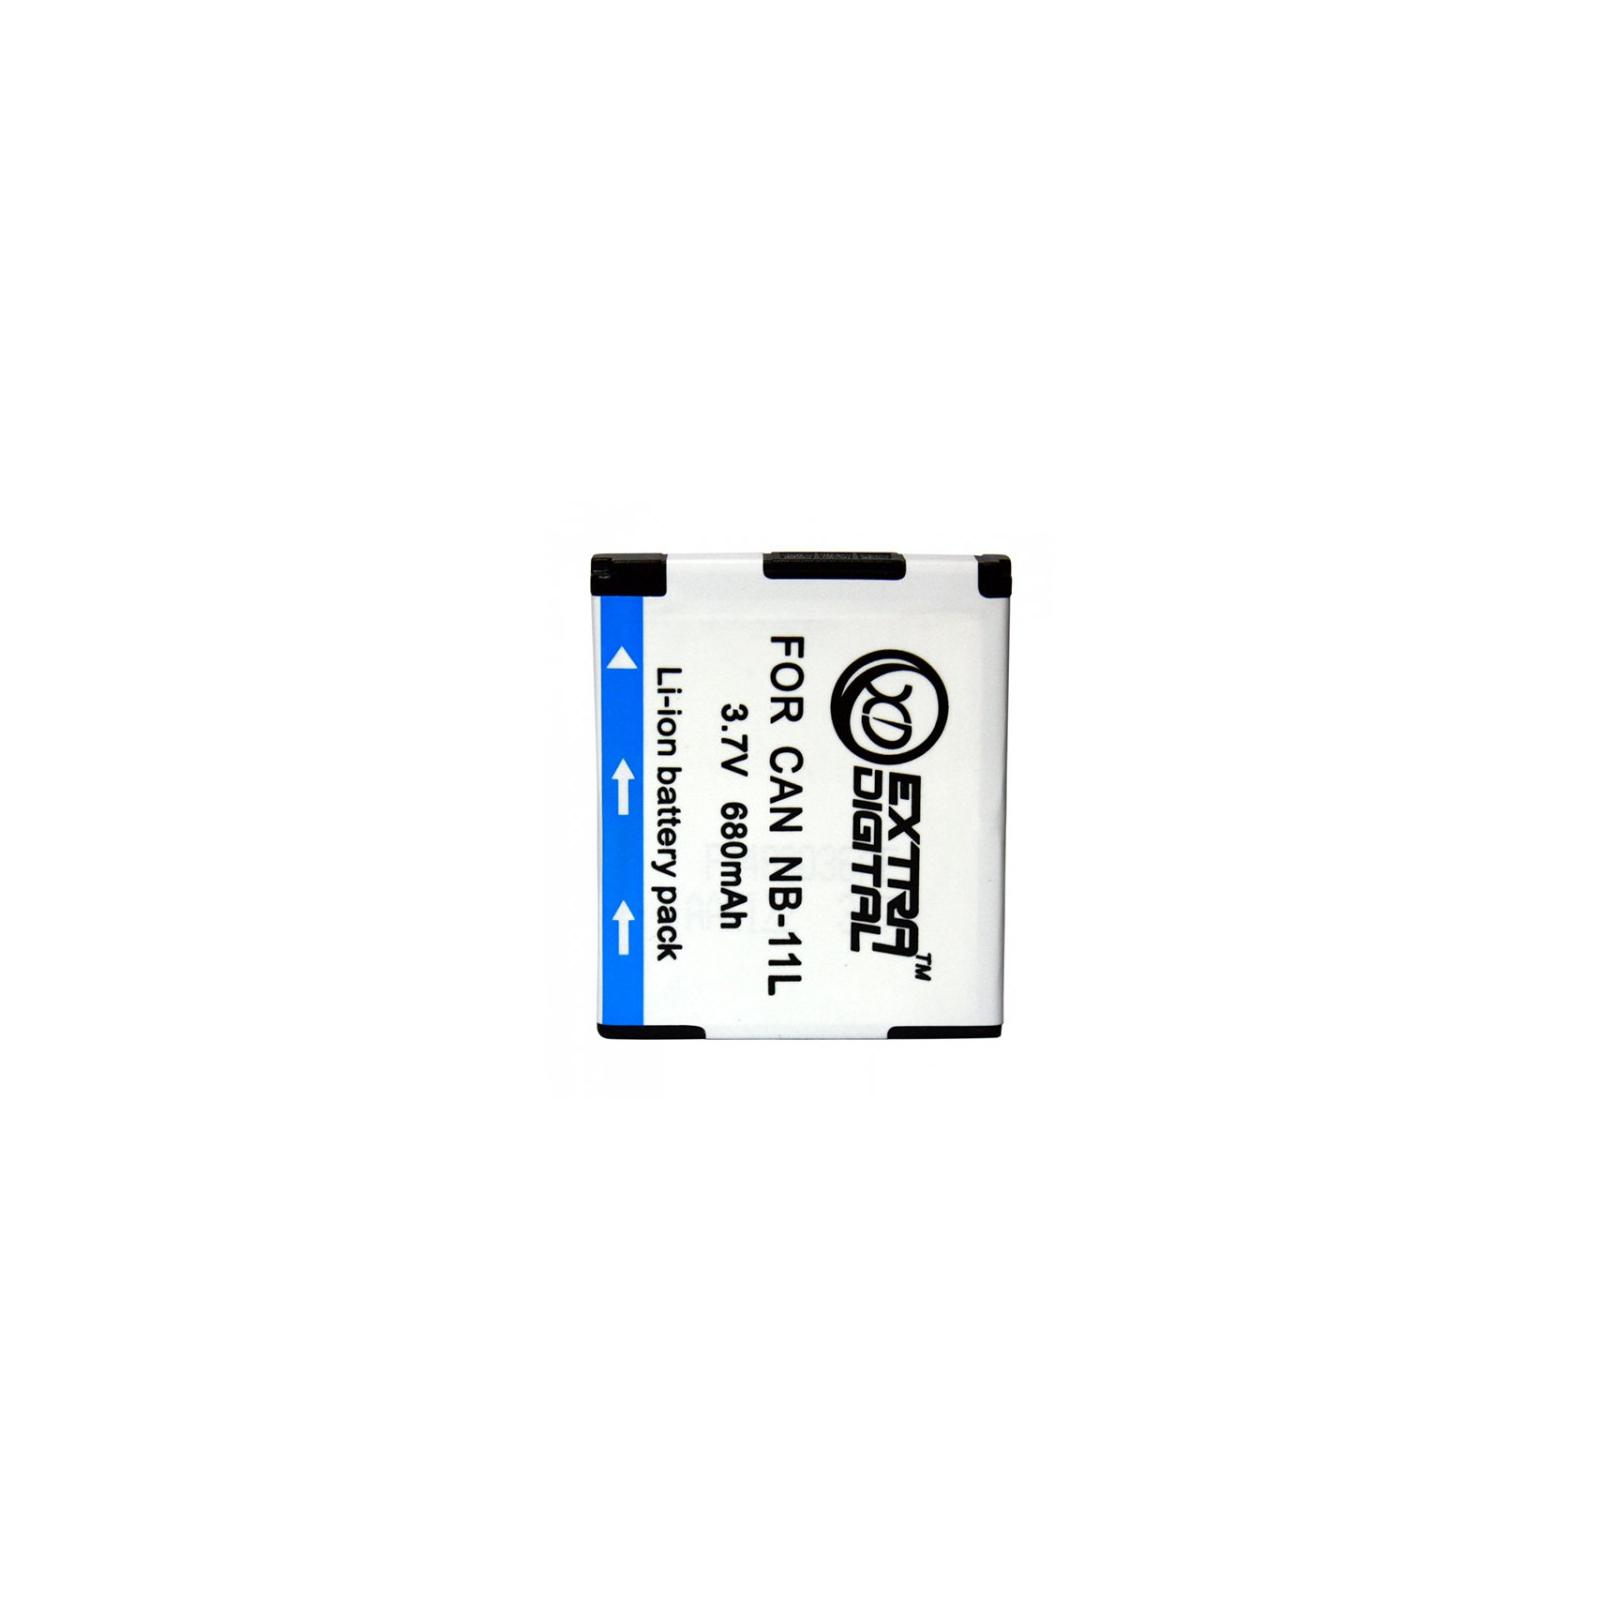 Аккумулятор к фото/видео EXTRADIGITAL Canon NB-11L (DV00DV1367)